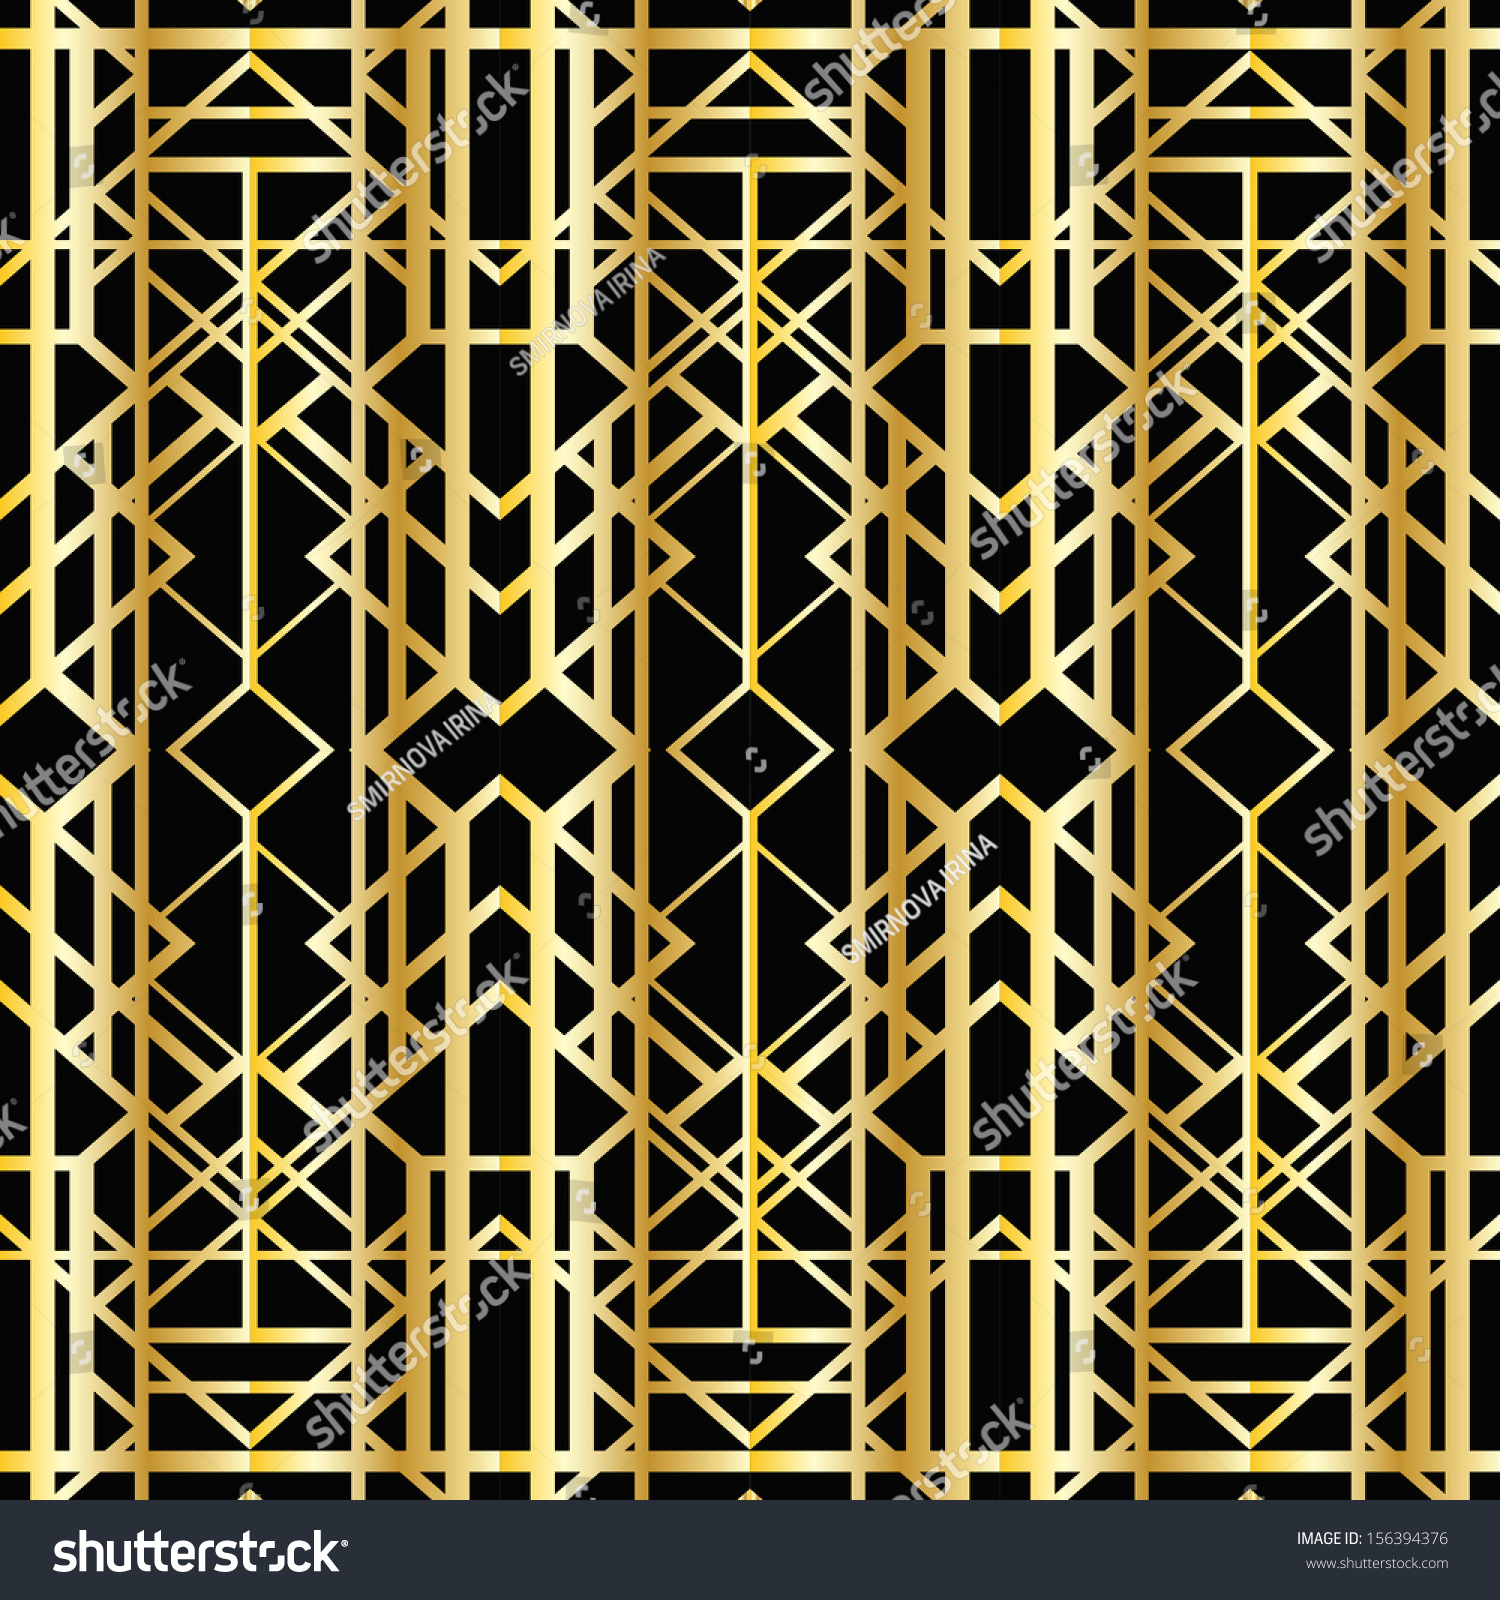 Art deco geometric pattern 1920 39 s style stock vector for Art deco look